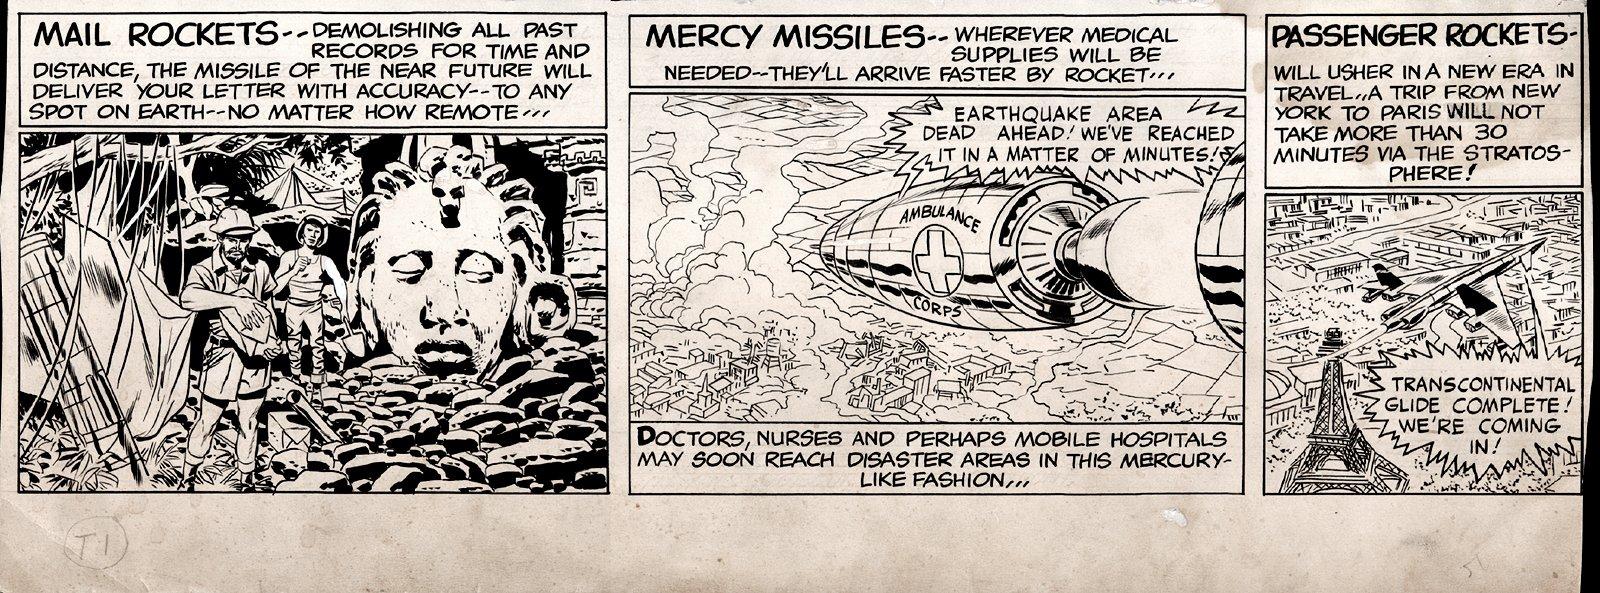 SKY MASTERS Bottom 1/3 Sunday Strip Art 5-24-1959